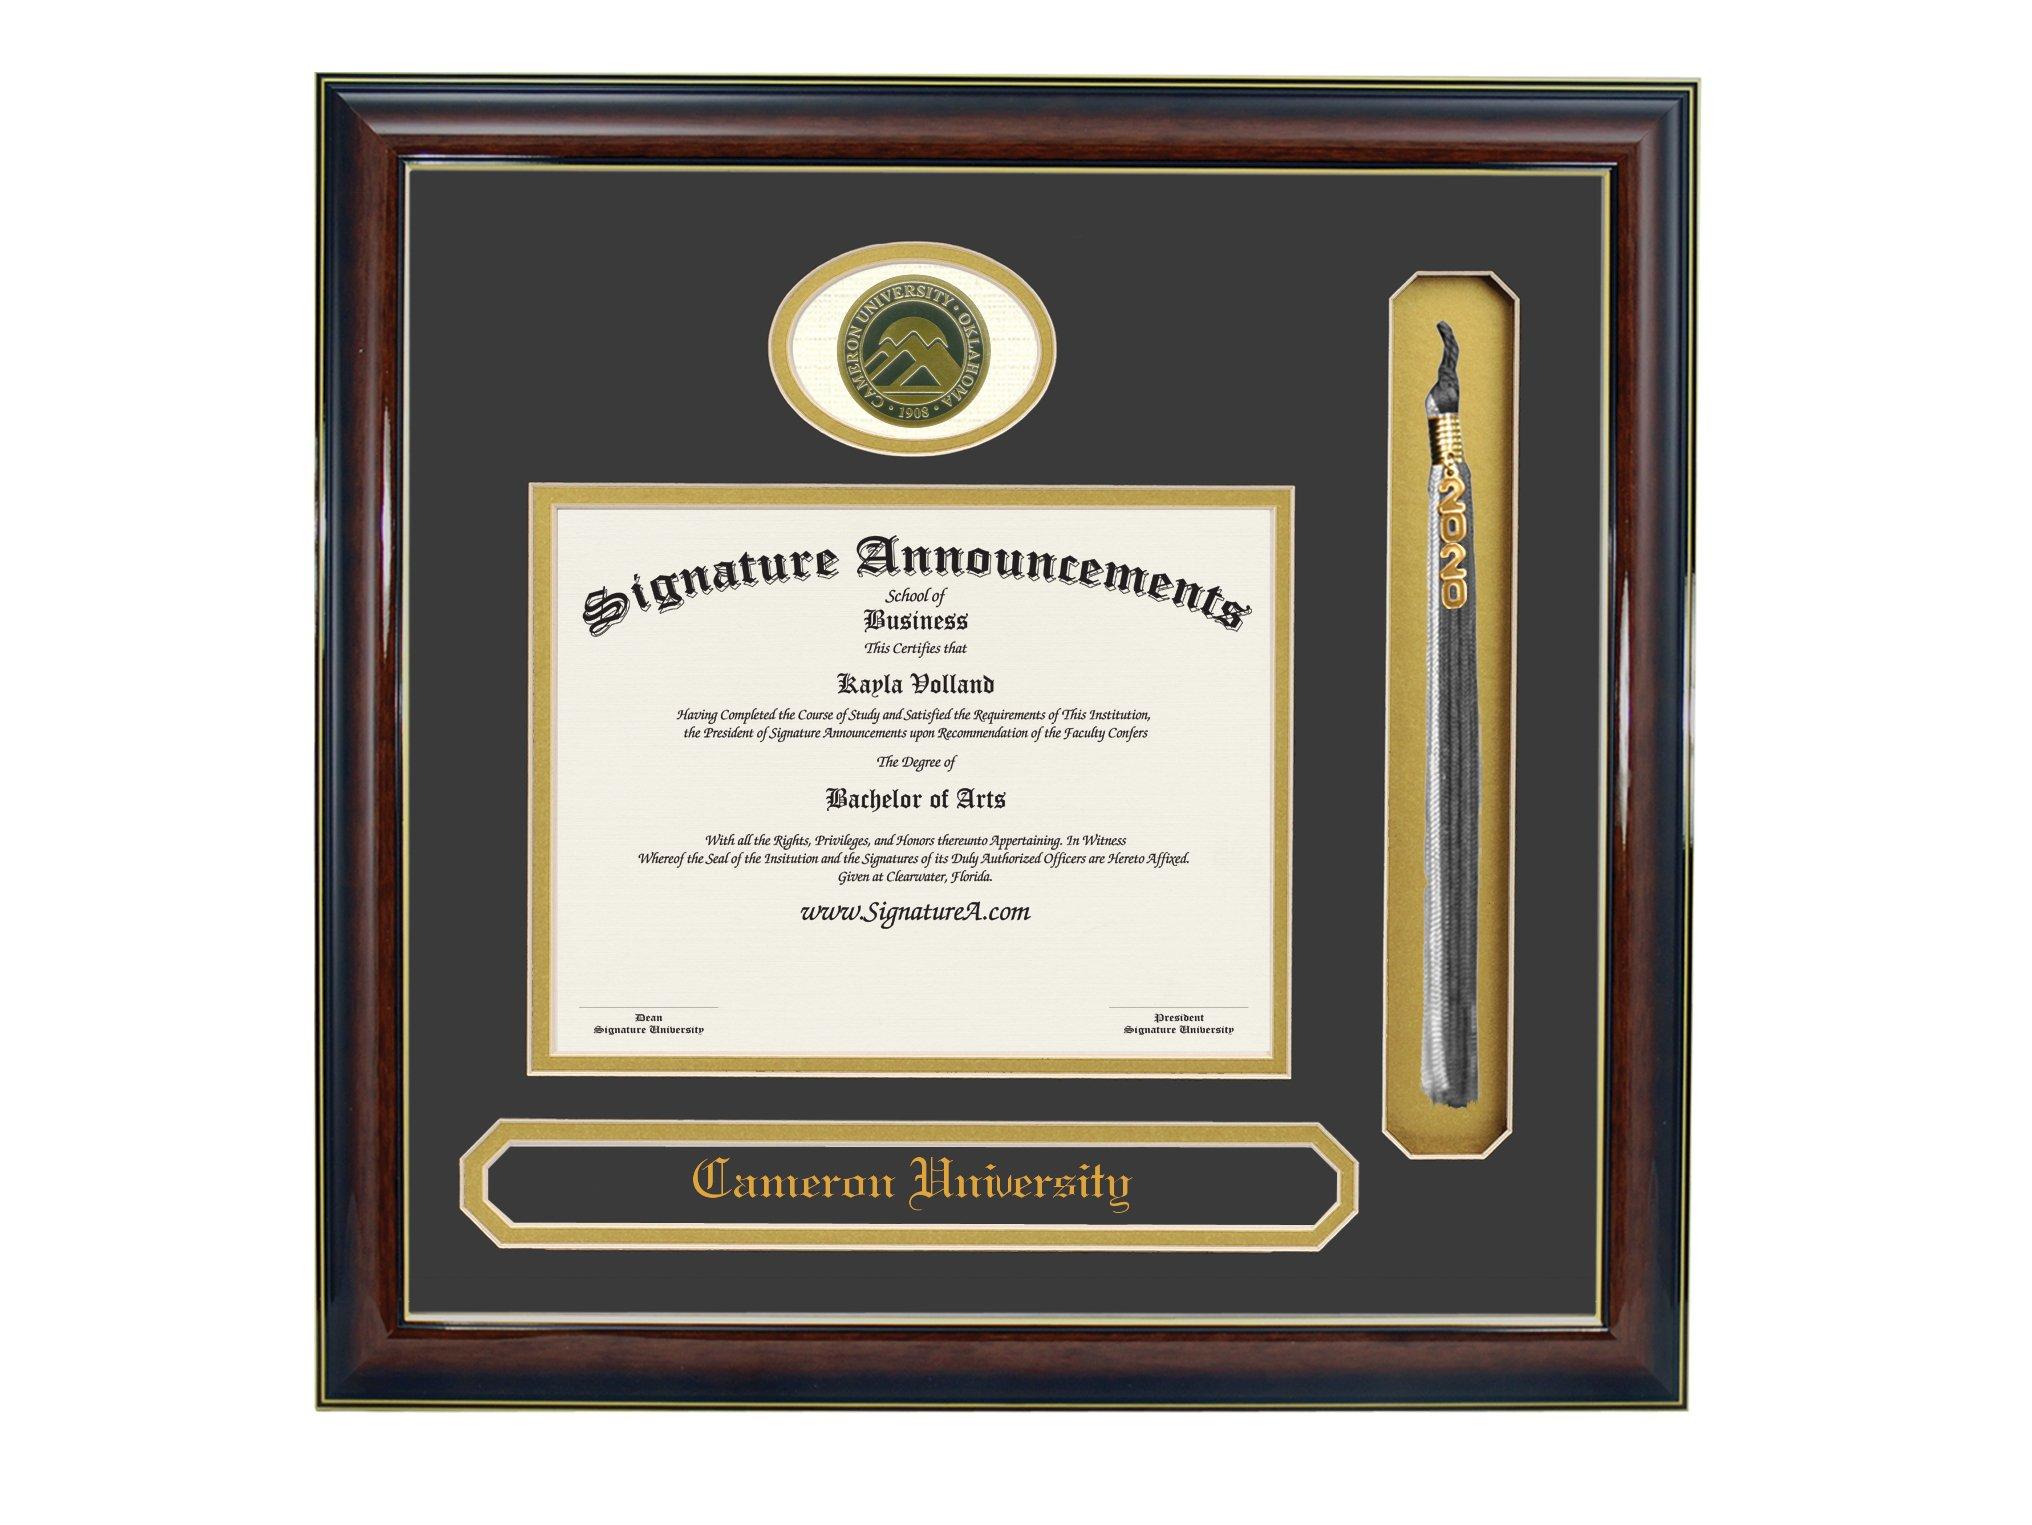 Signature Announcements Cameron-University Undergraduate, Graduate/Professional/Doctor Sculpted Foil Seal, Name & Tassel Diploma Frame, 16'' x 16'', Gold Accent Gloss Mahogany